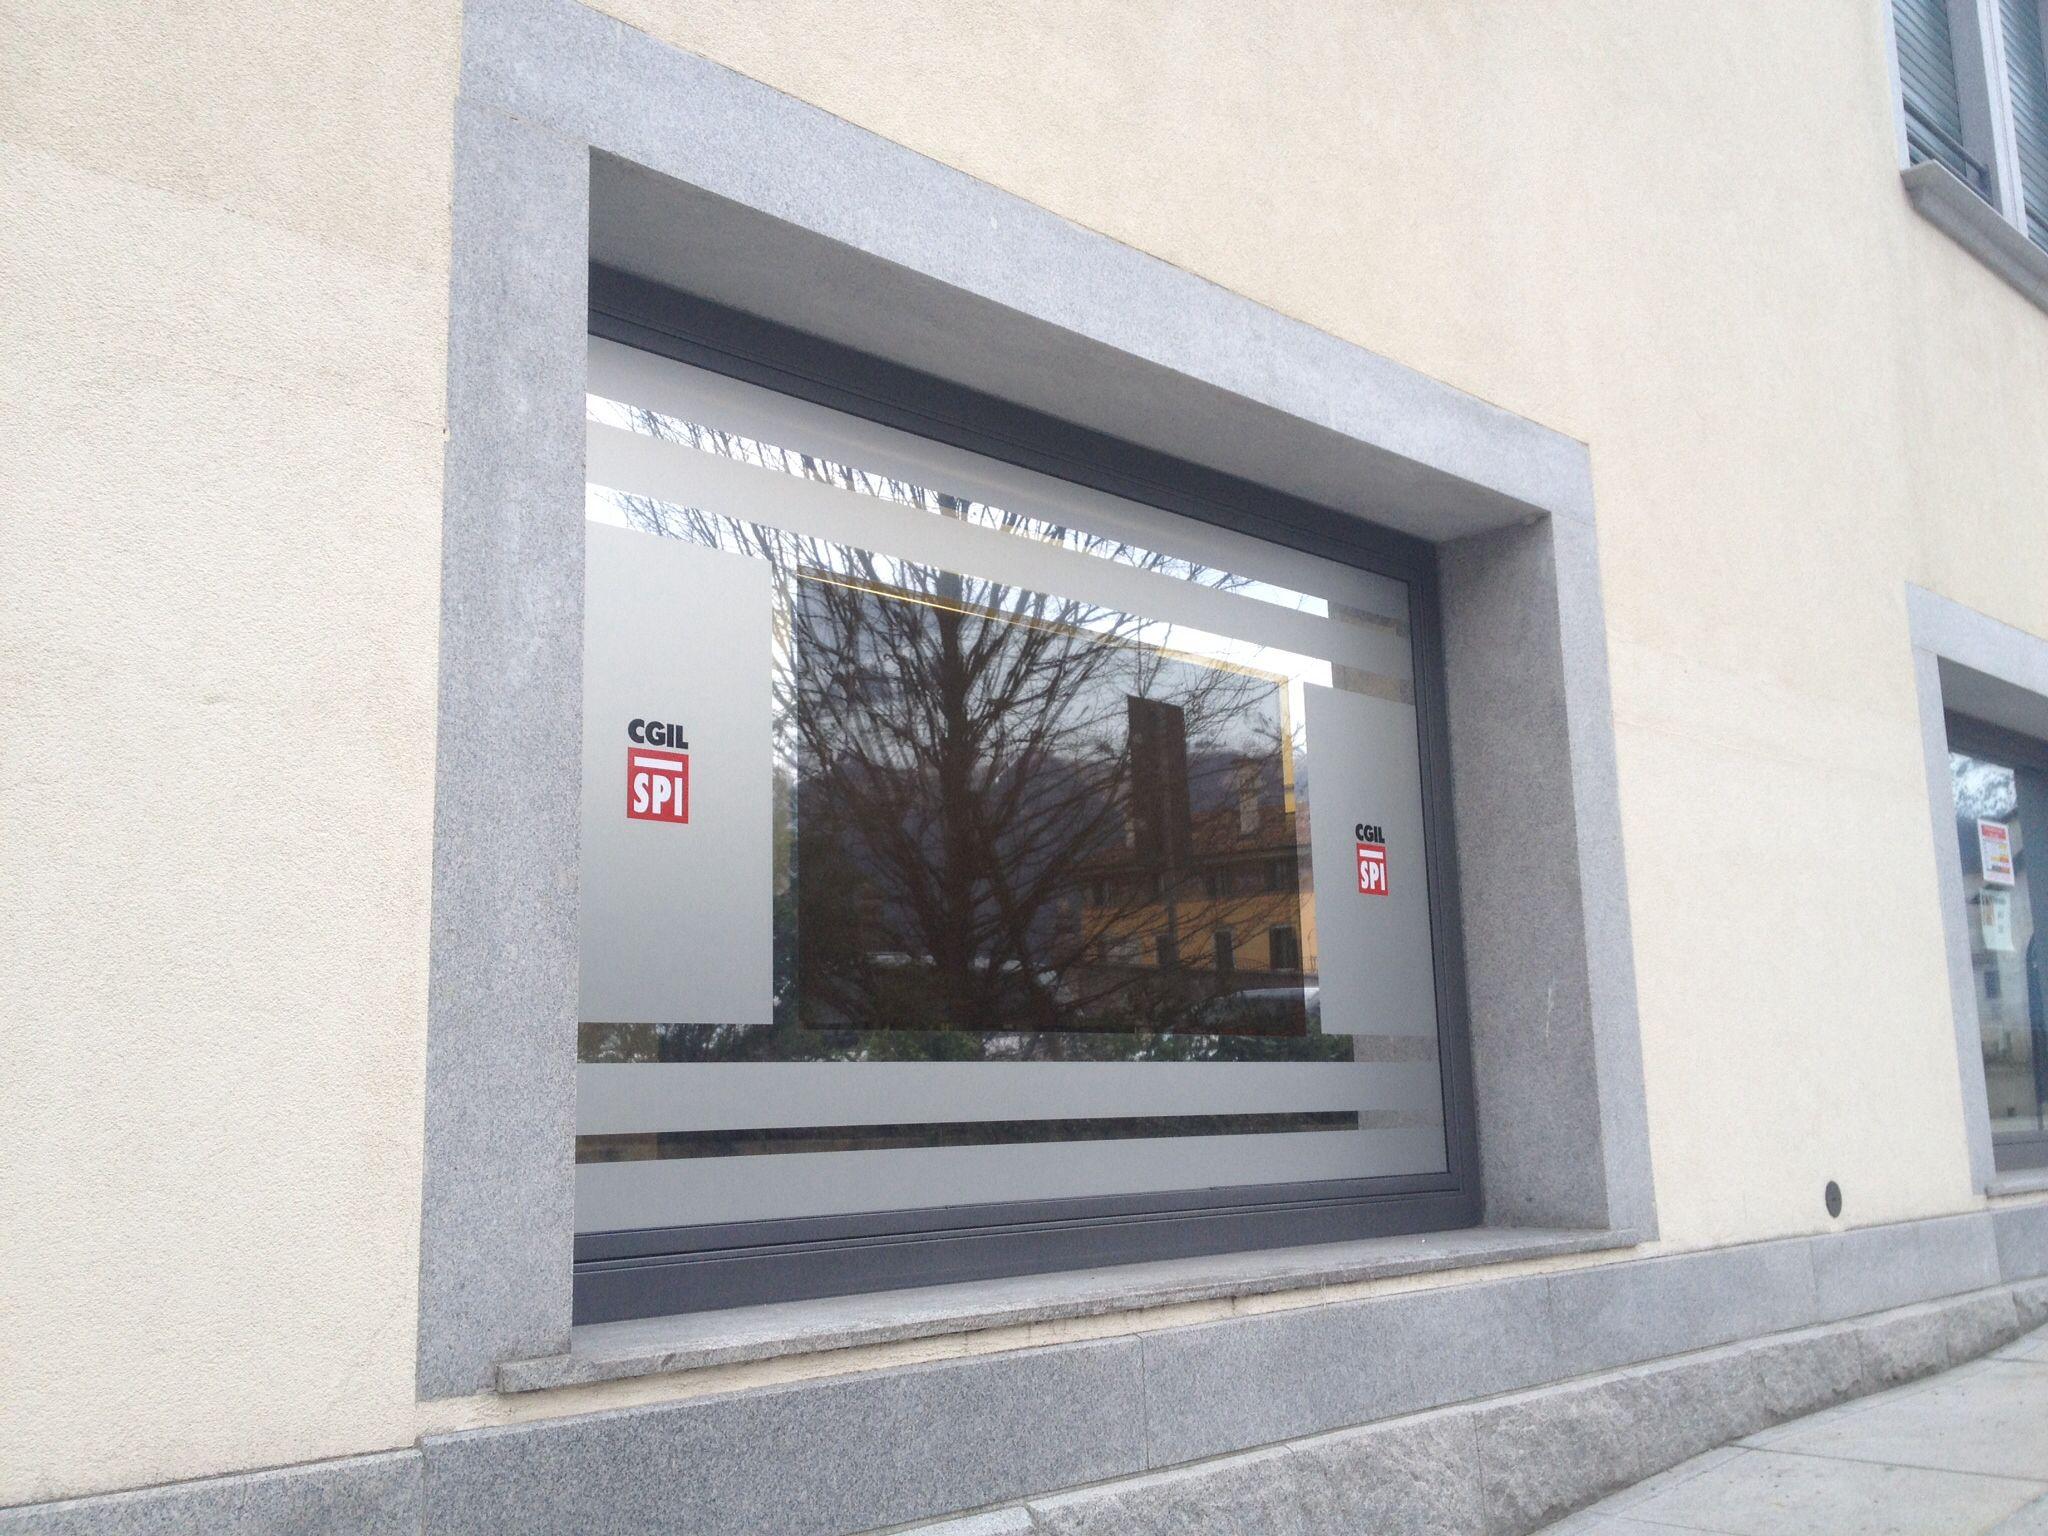 Vetrofania + pellicola monitor 3m Vikuity http://www.ventotto.net/vetrofanie/